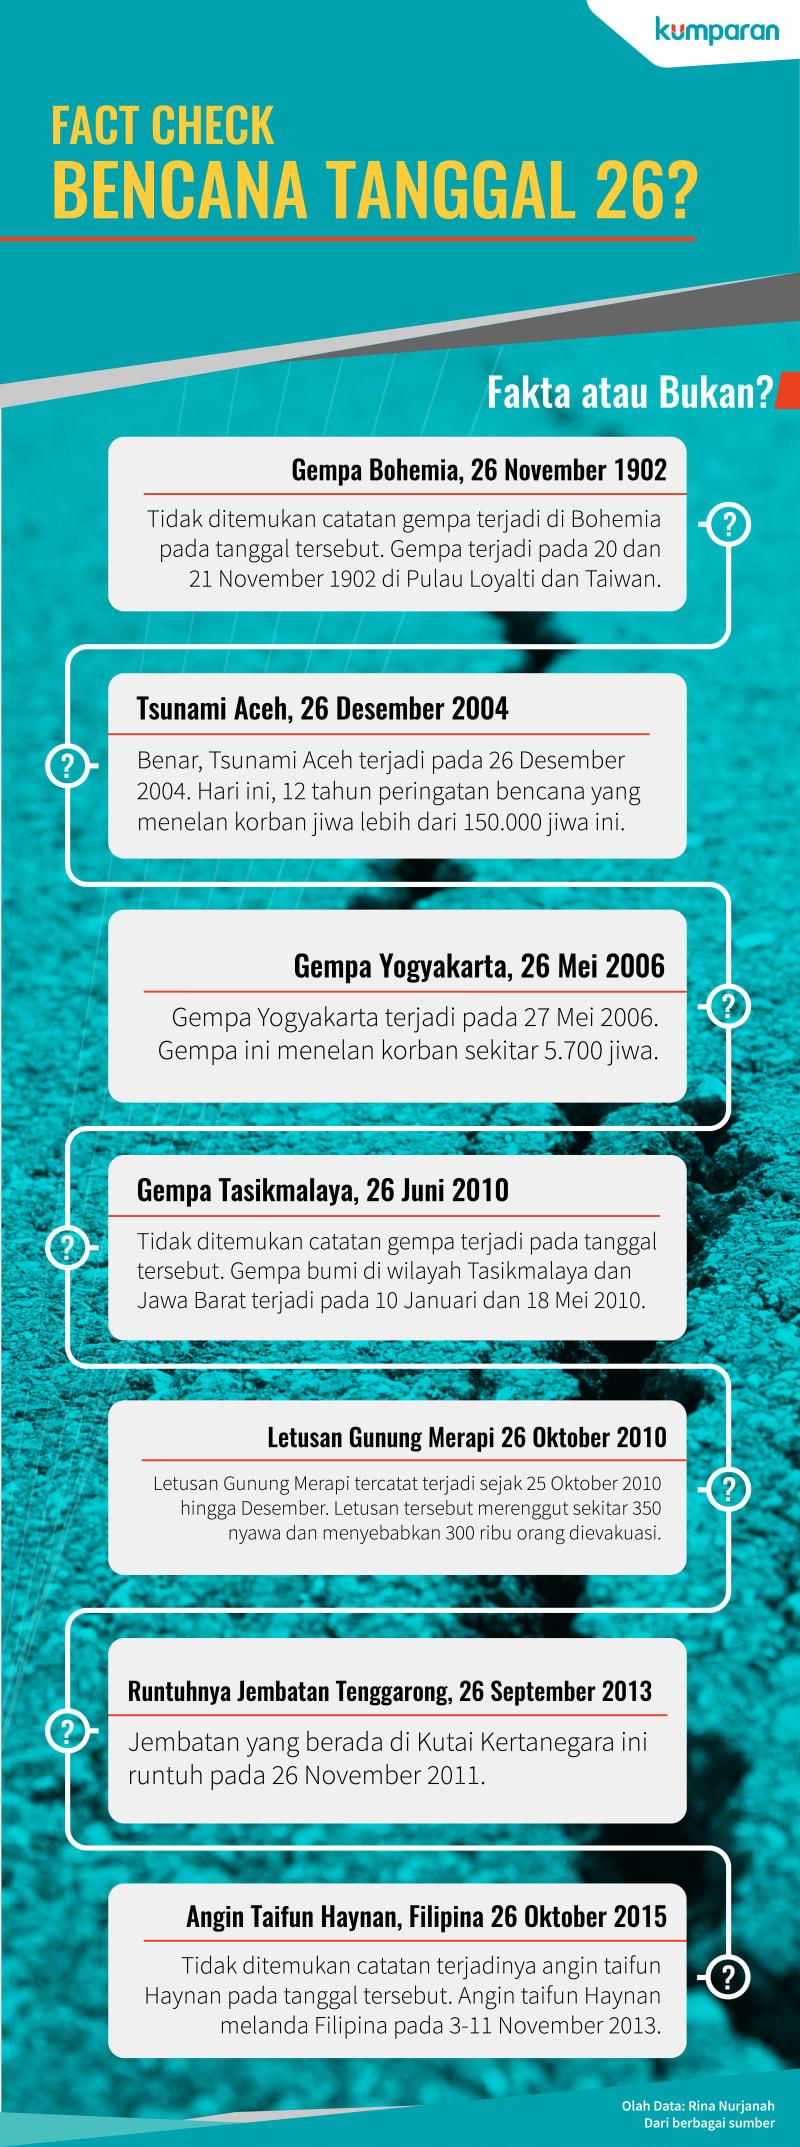 Infografis Bencana Tanggal 26?